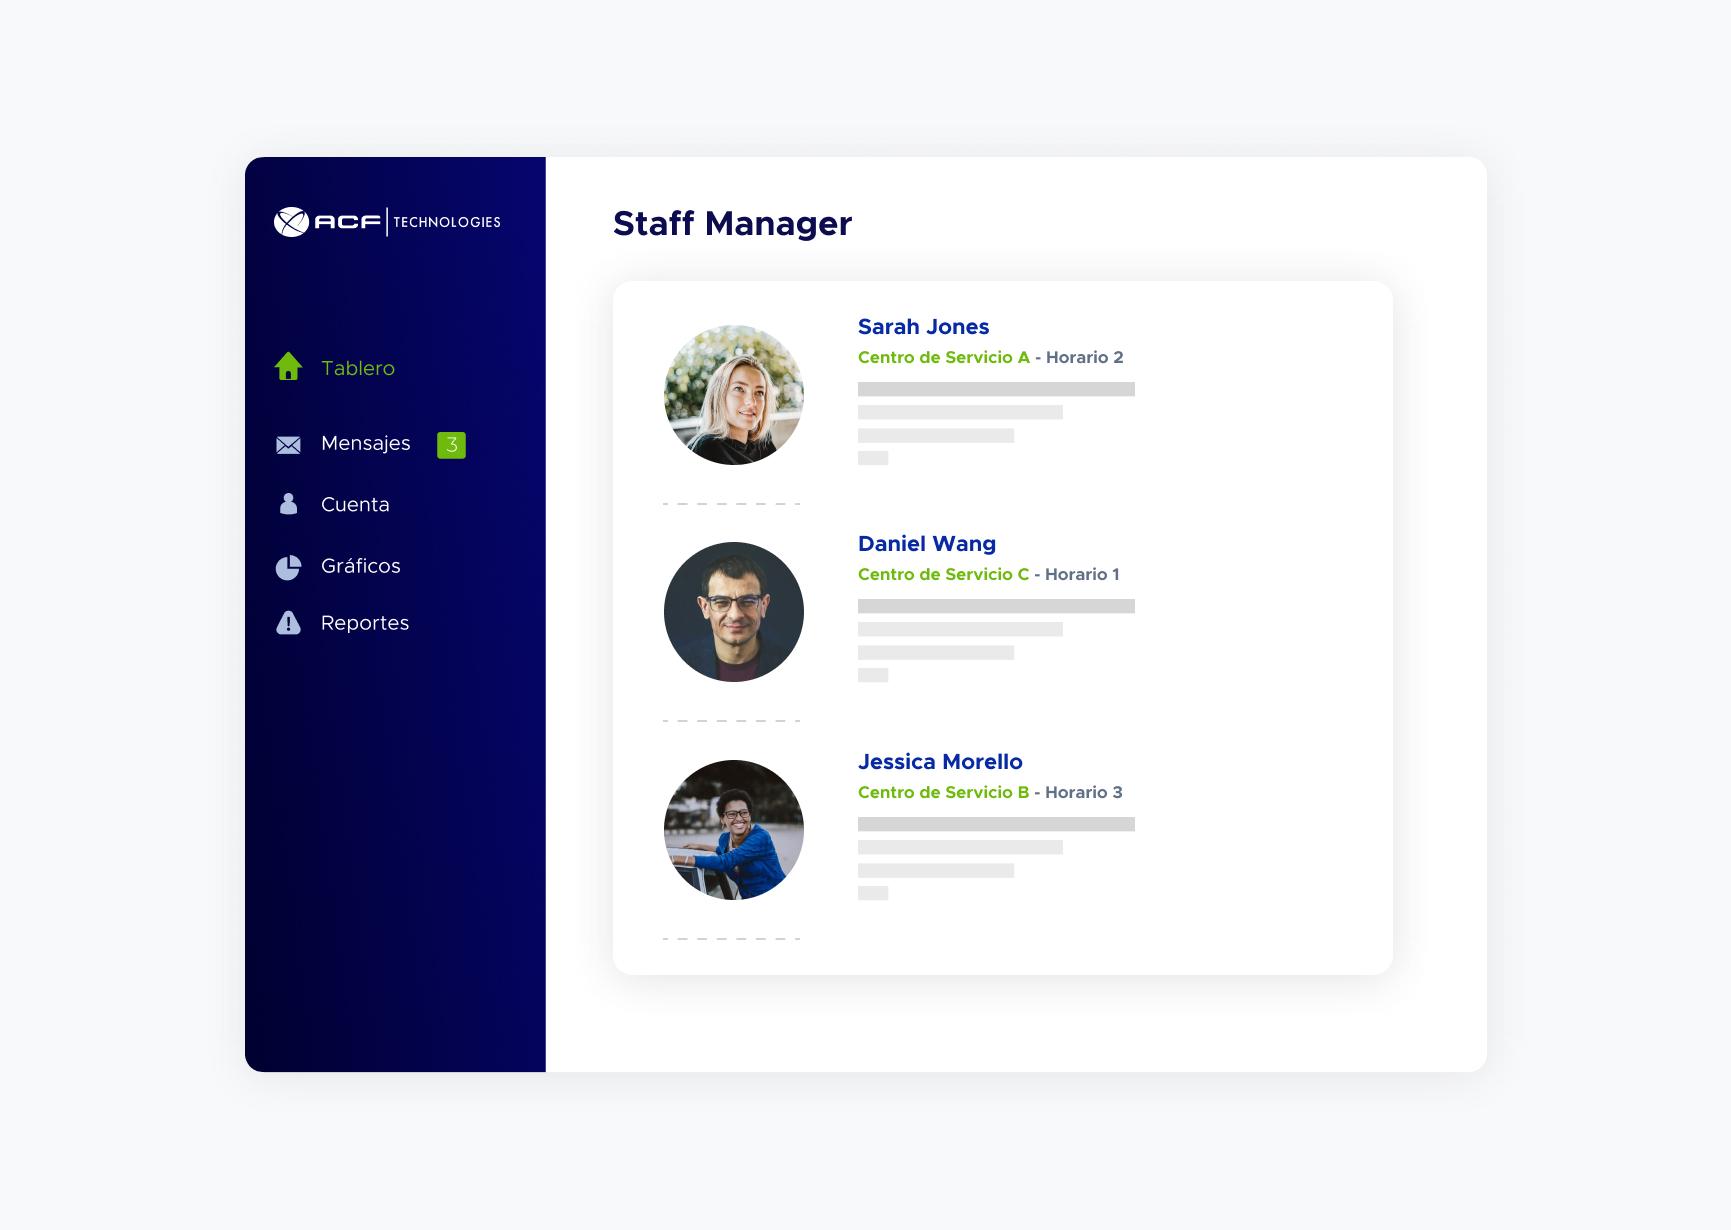 Vista de pantalla de la solución de Staff Management de ACF Technologies